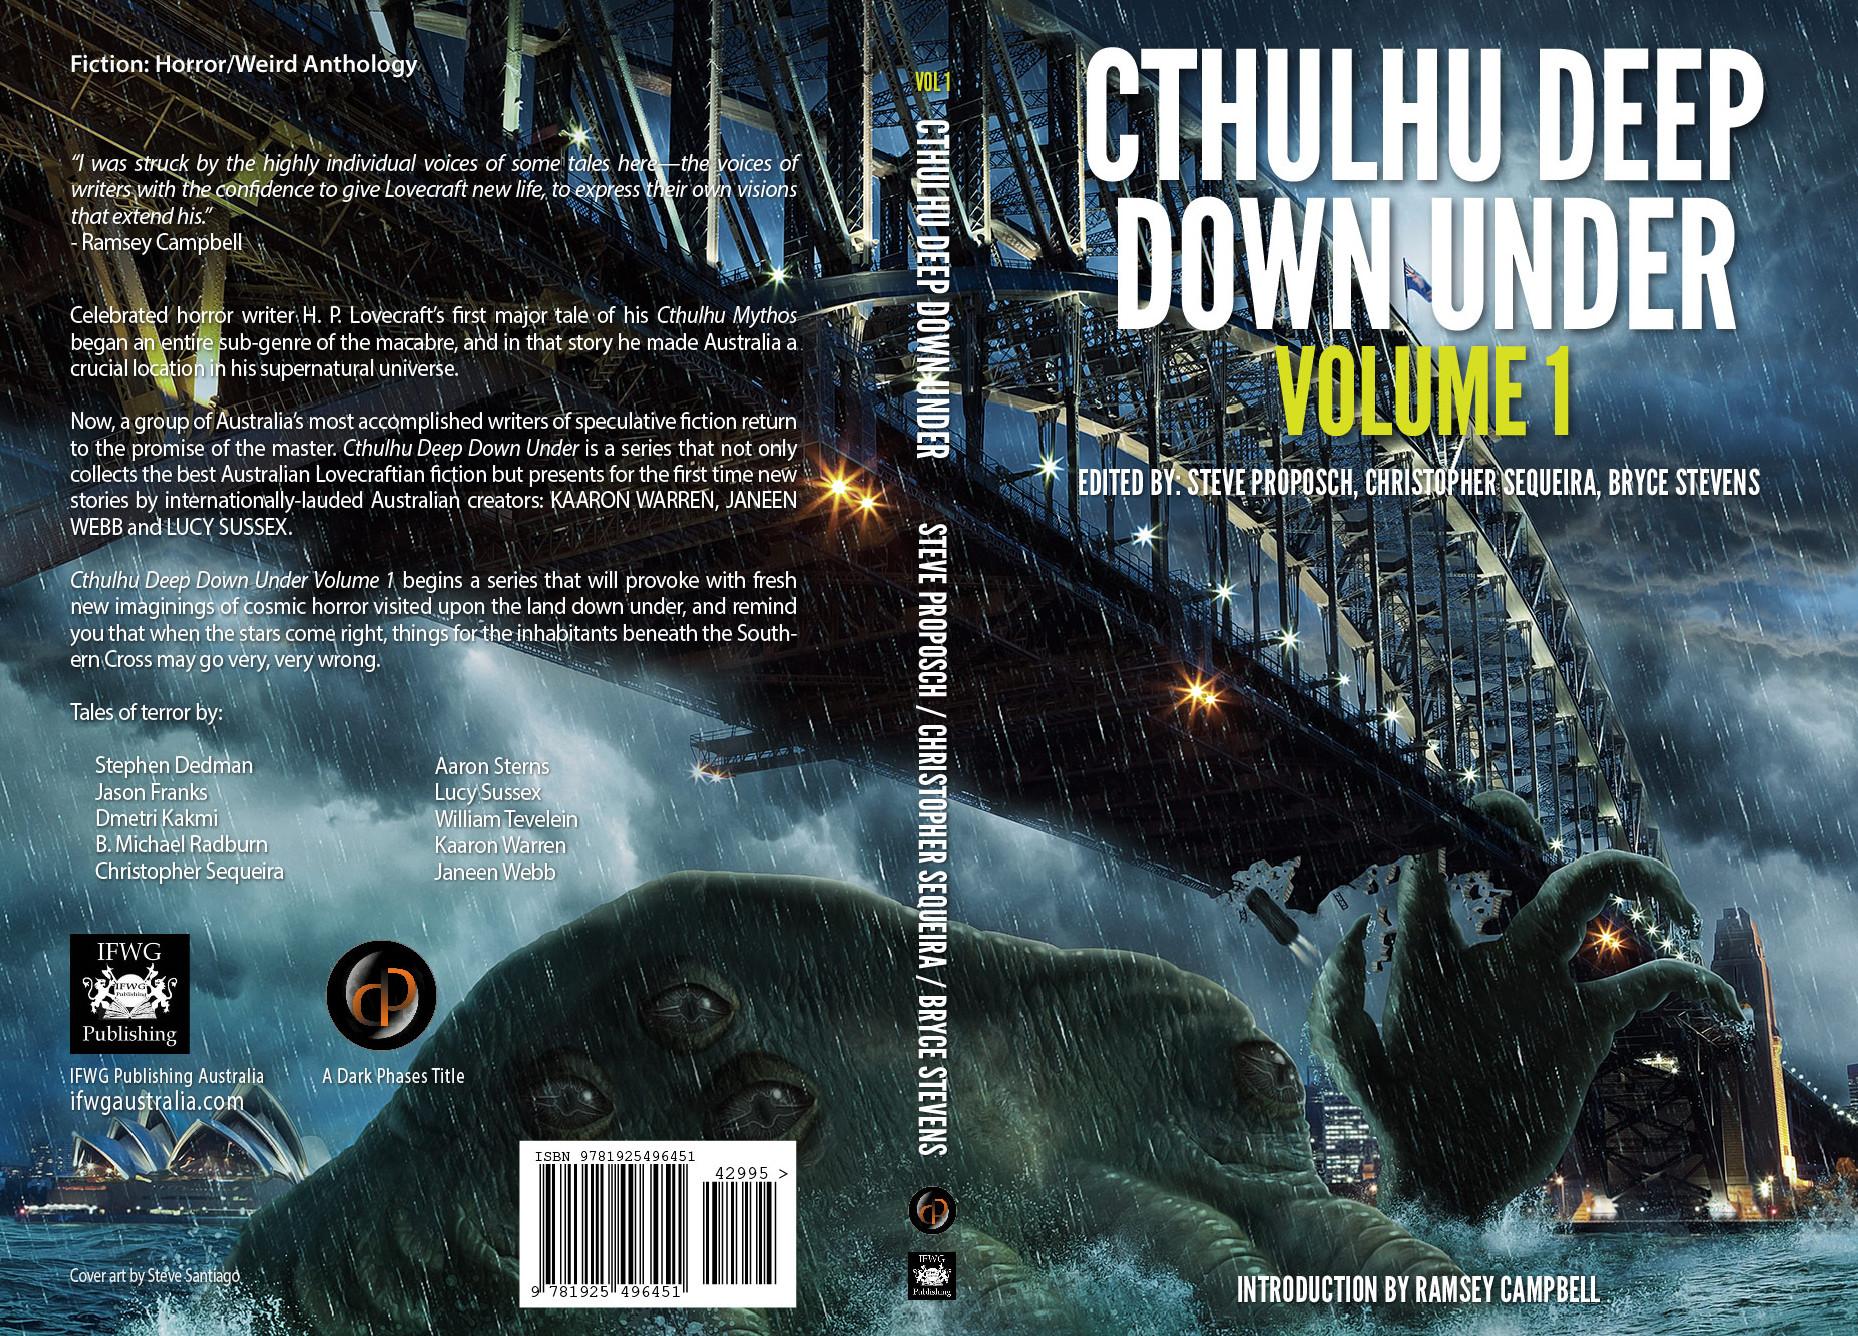 CDDU1 full spread